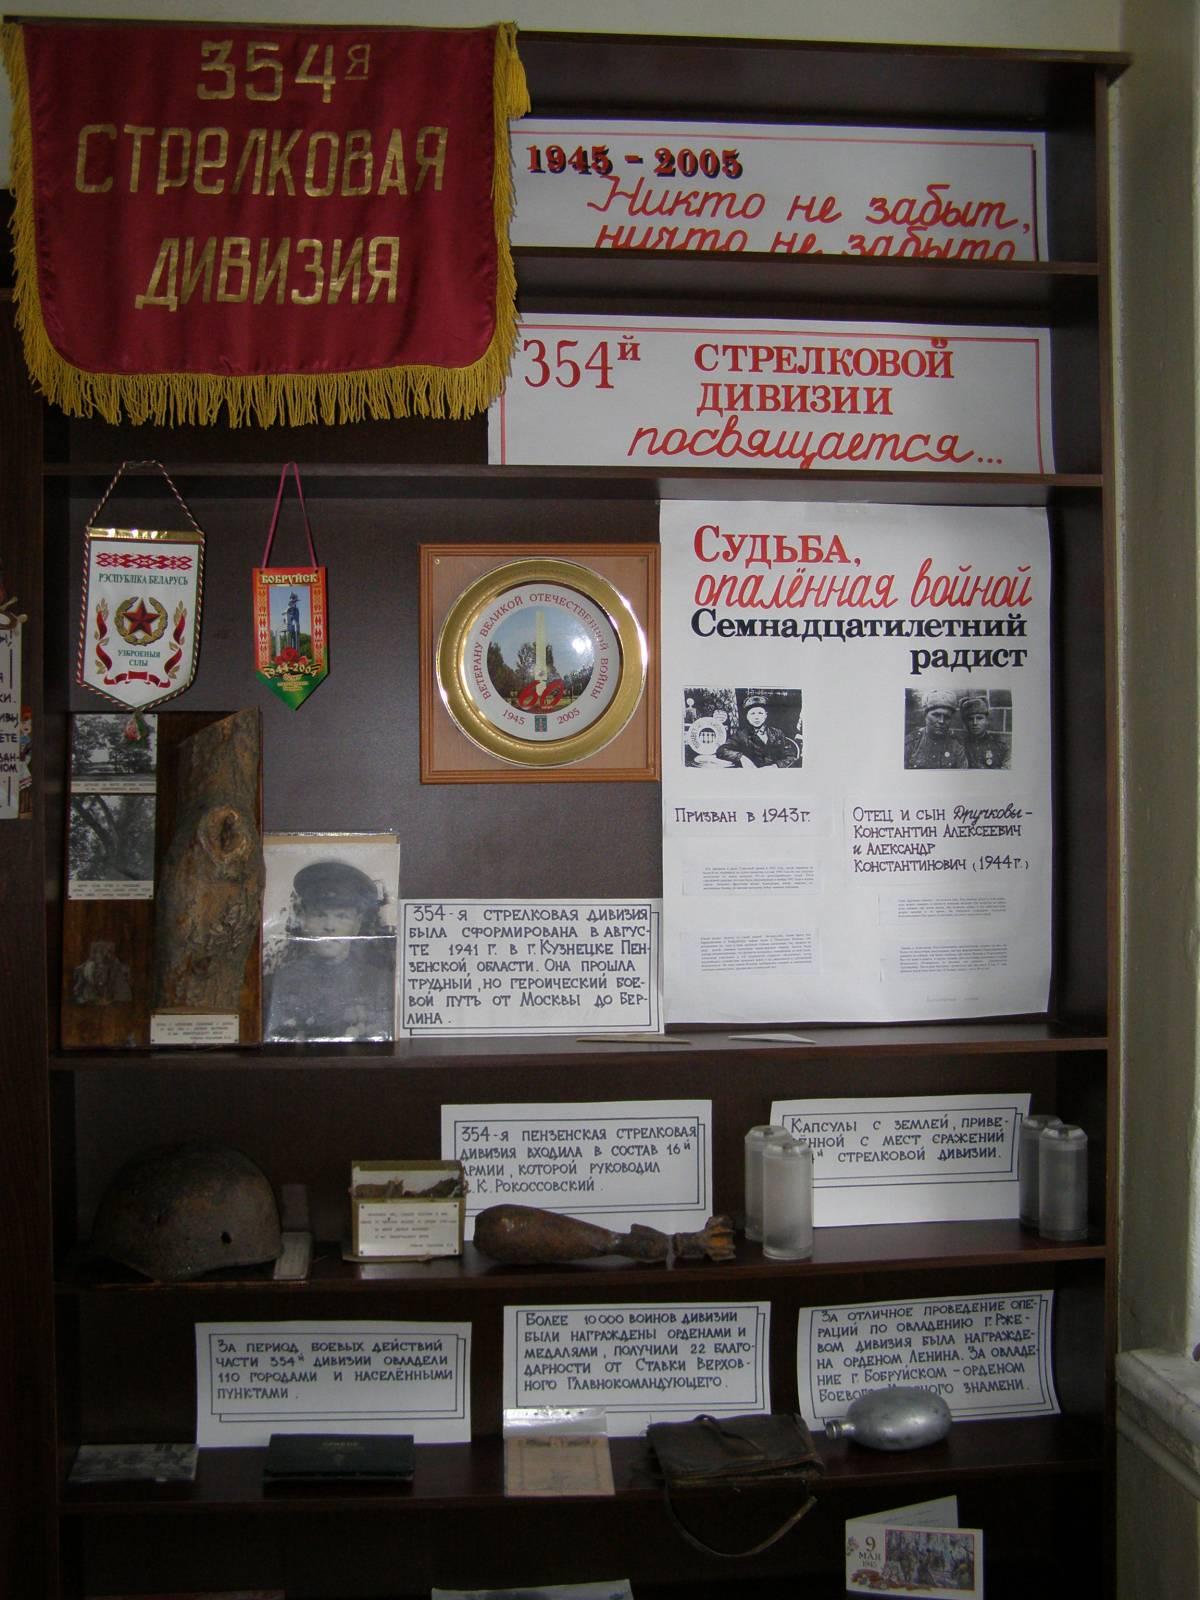 http://s49.ucoz.ru/_ph/6/722494911.jpg